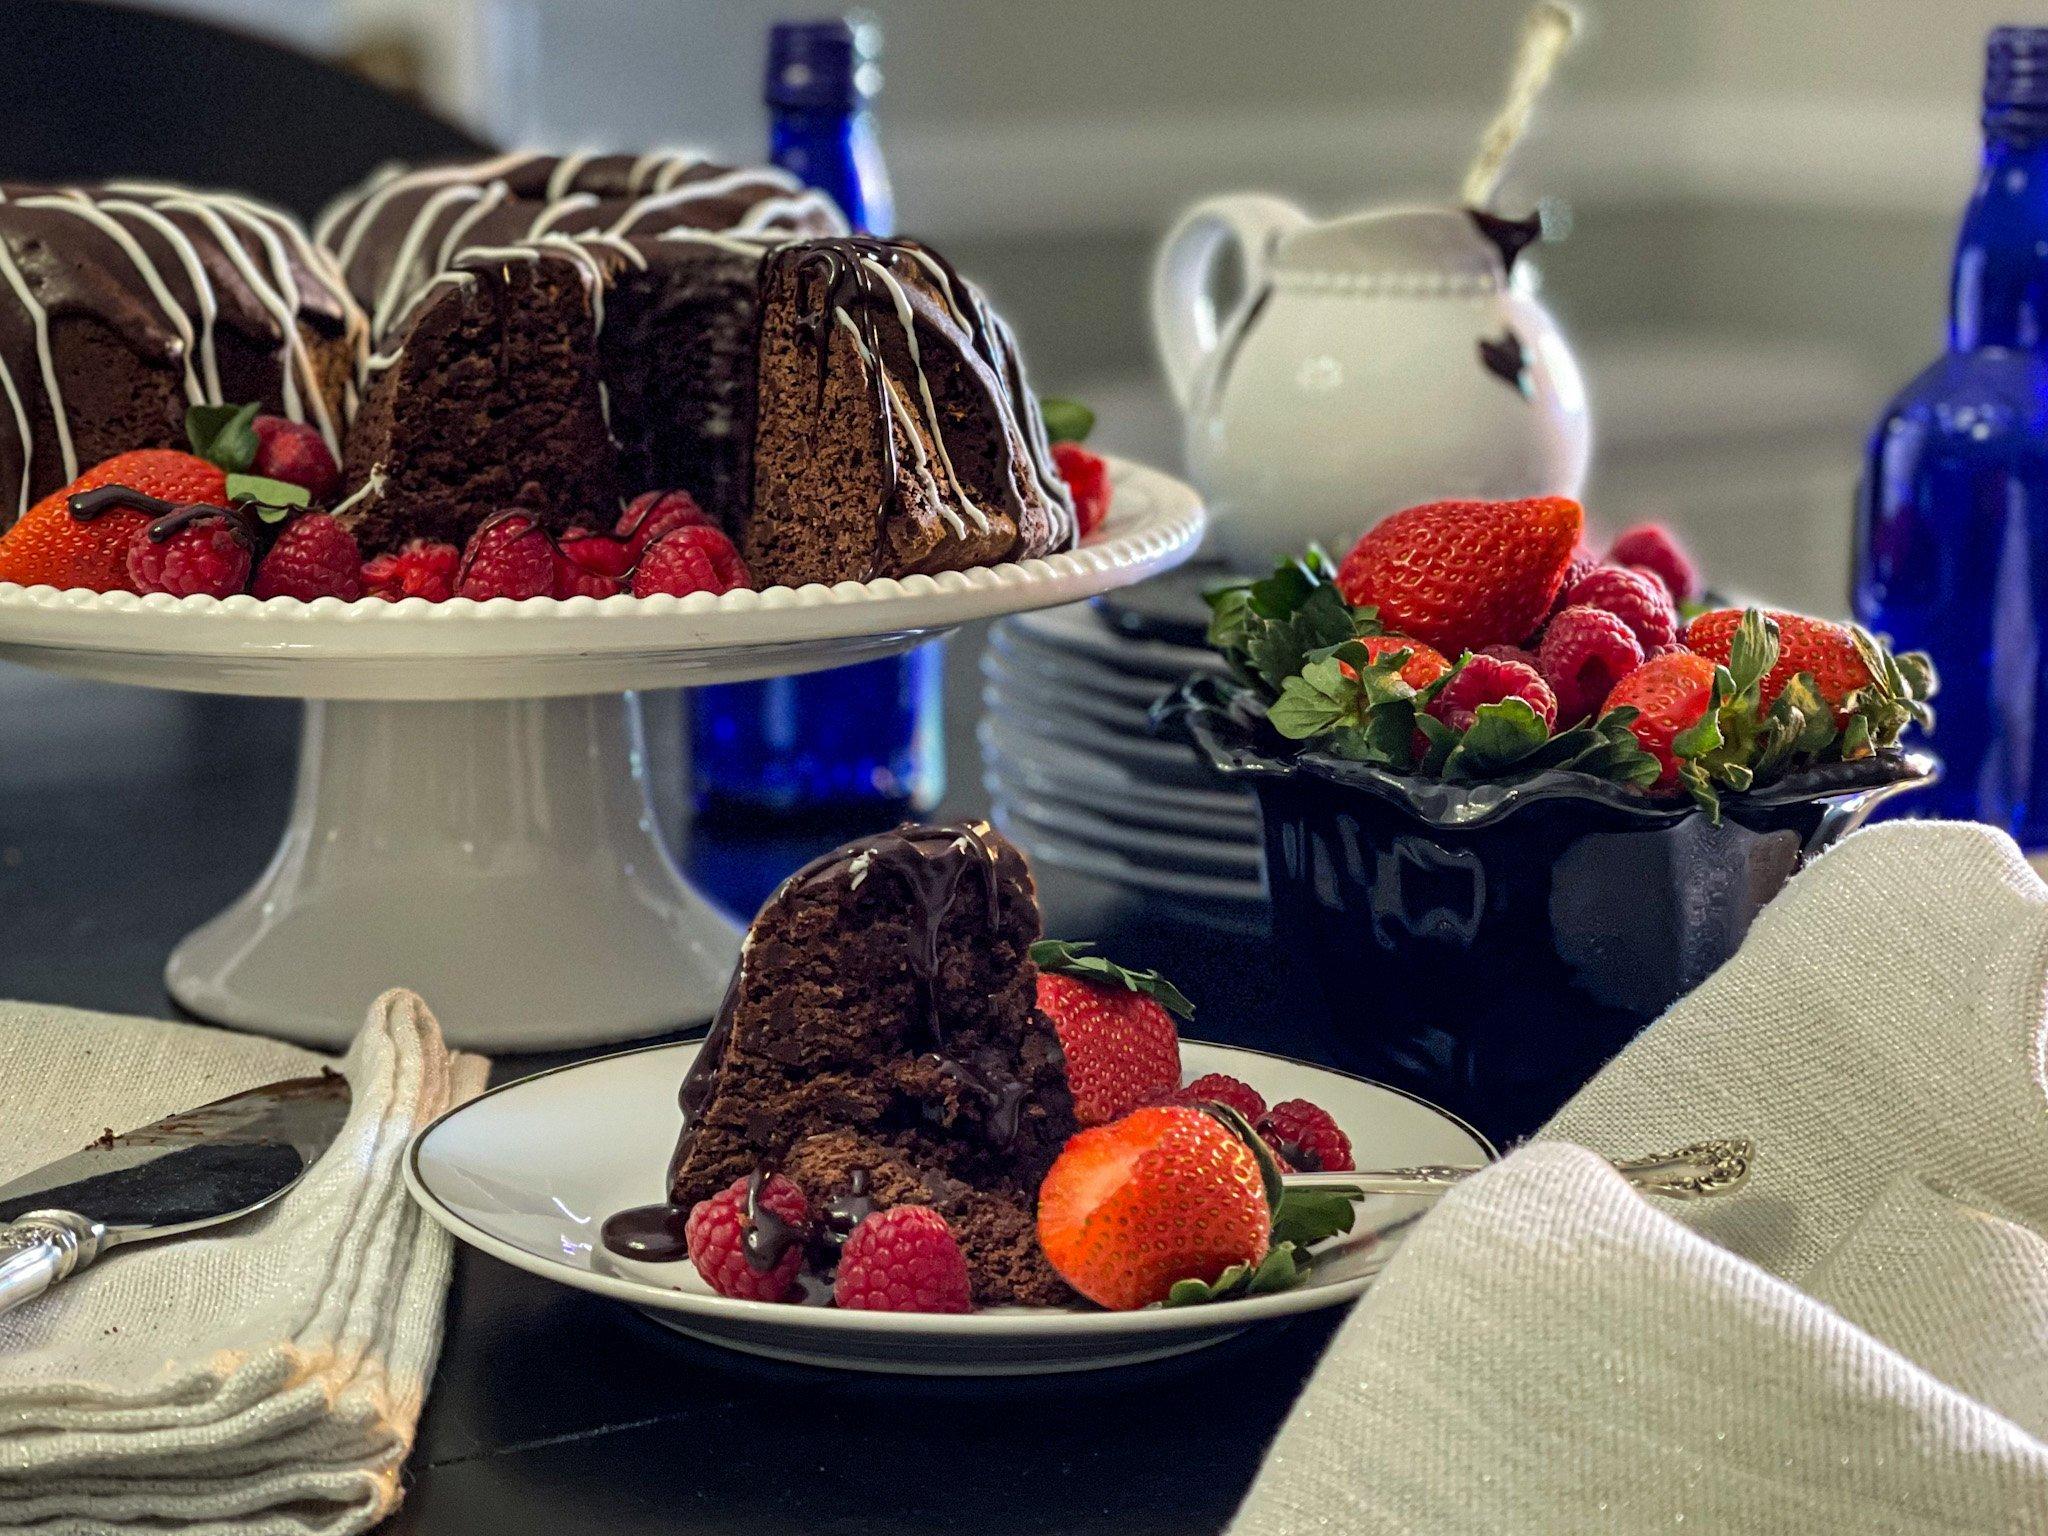 Hot Cakes Bakery - Chocolate Mountain Cake 1